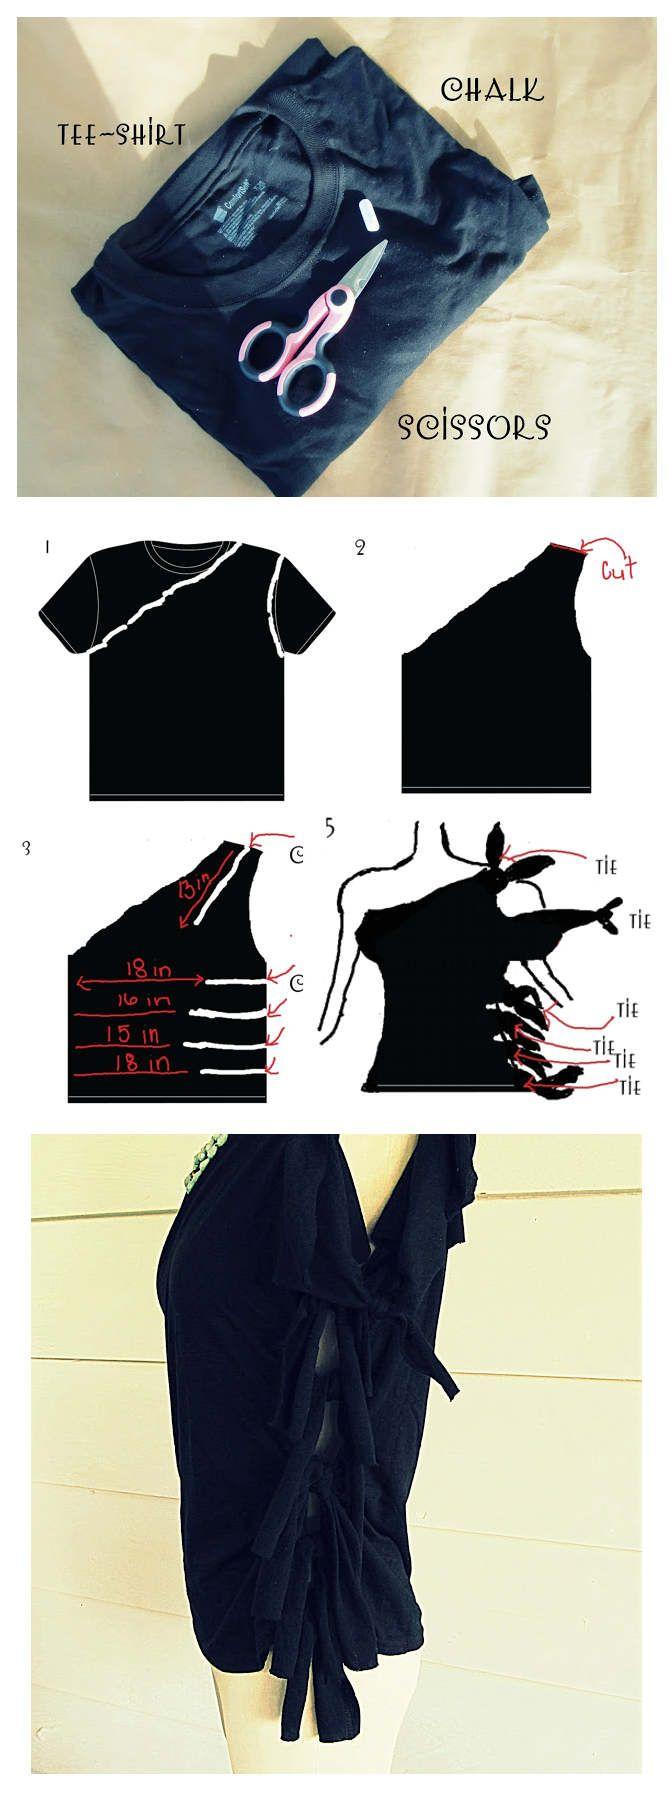 Cum modifici un tricou mare